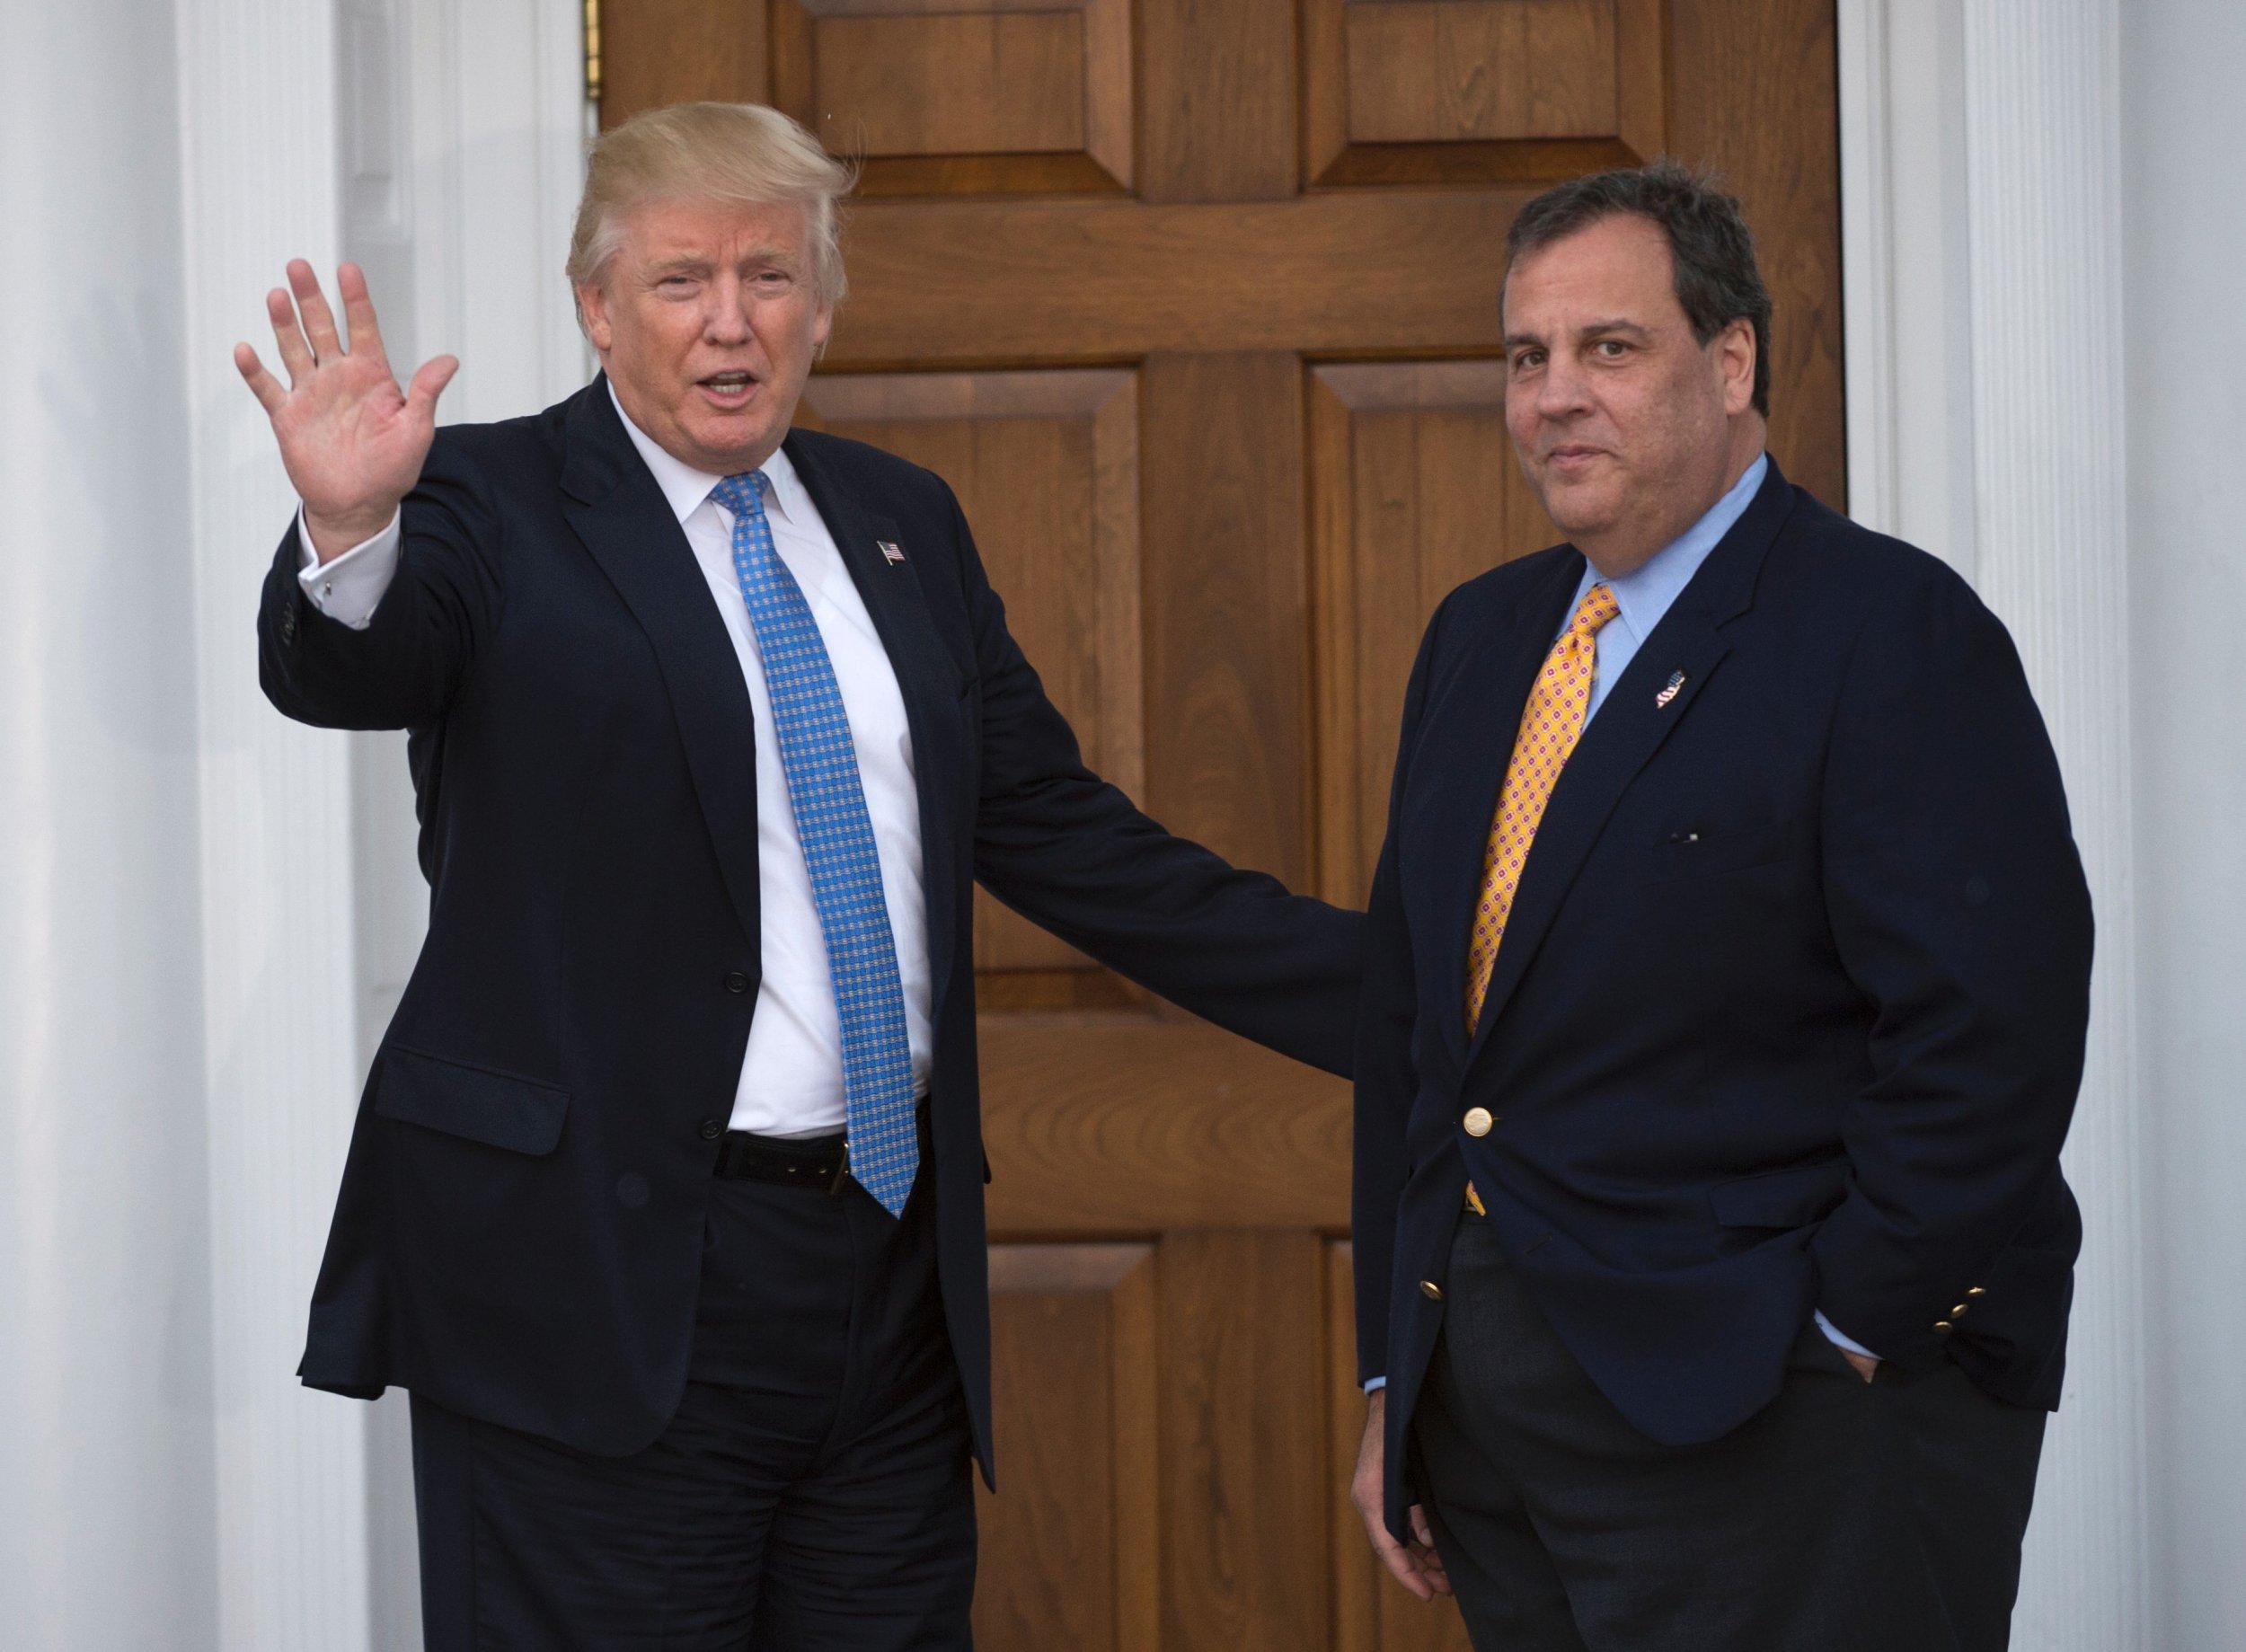 donald trump, attorney general, fox news guest